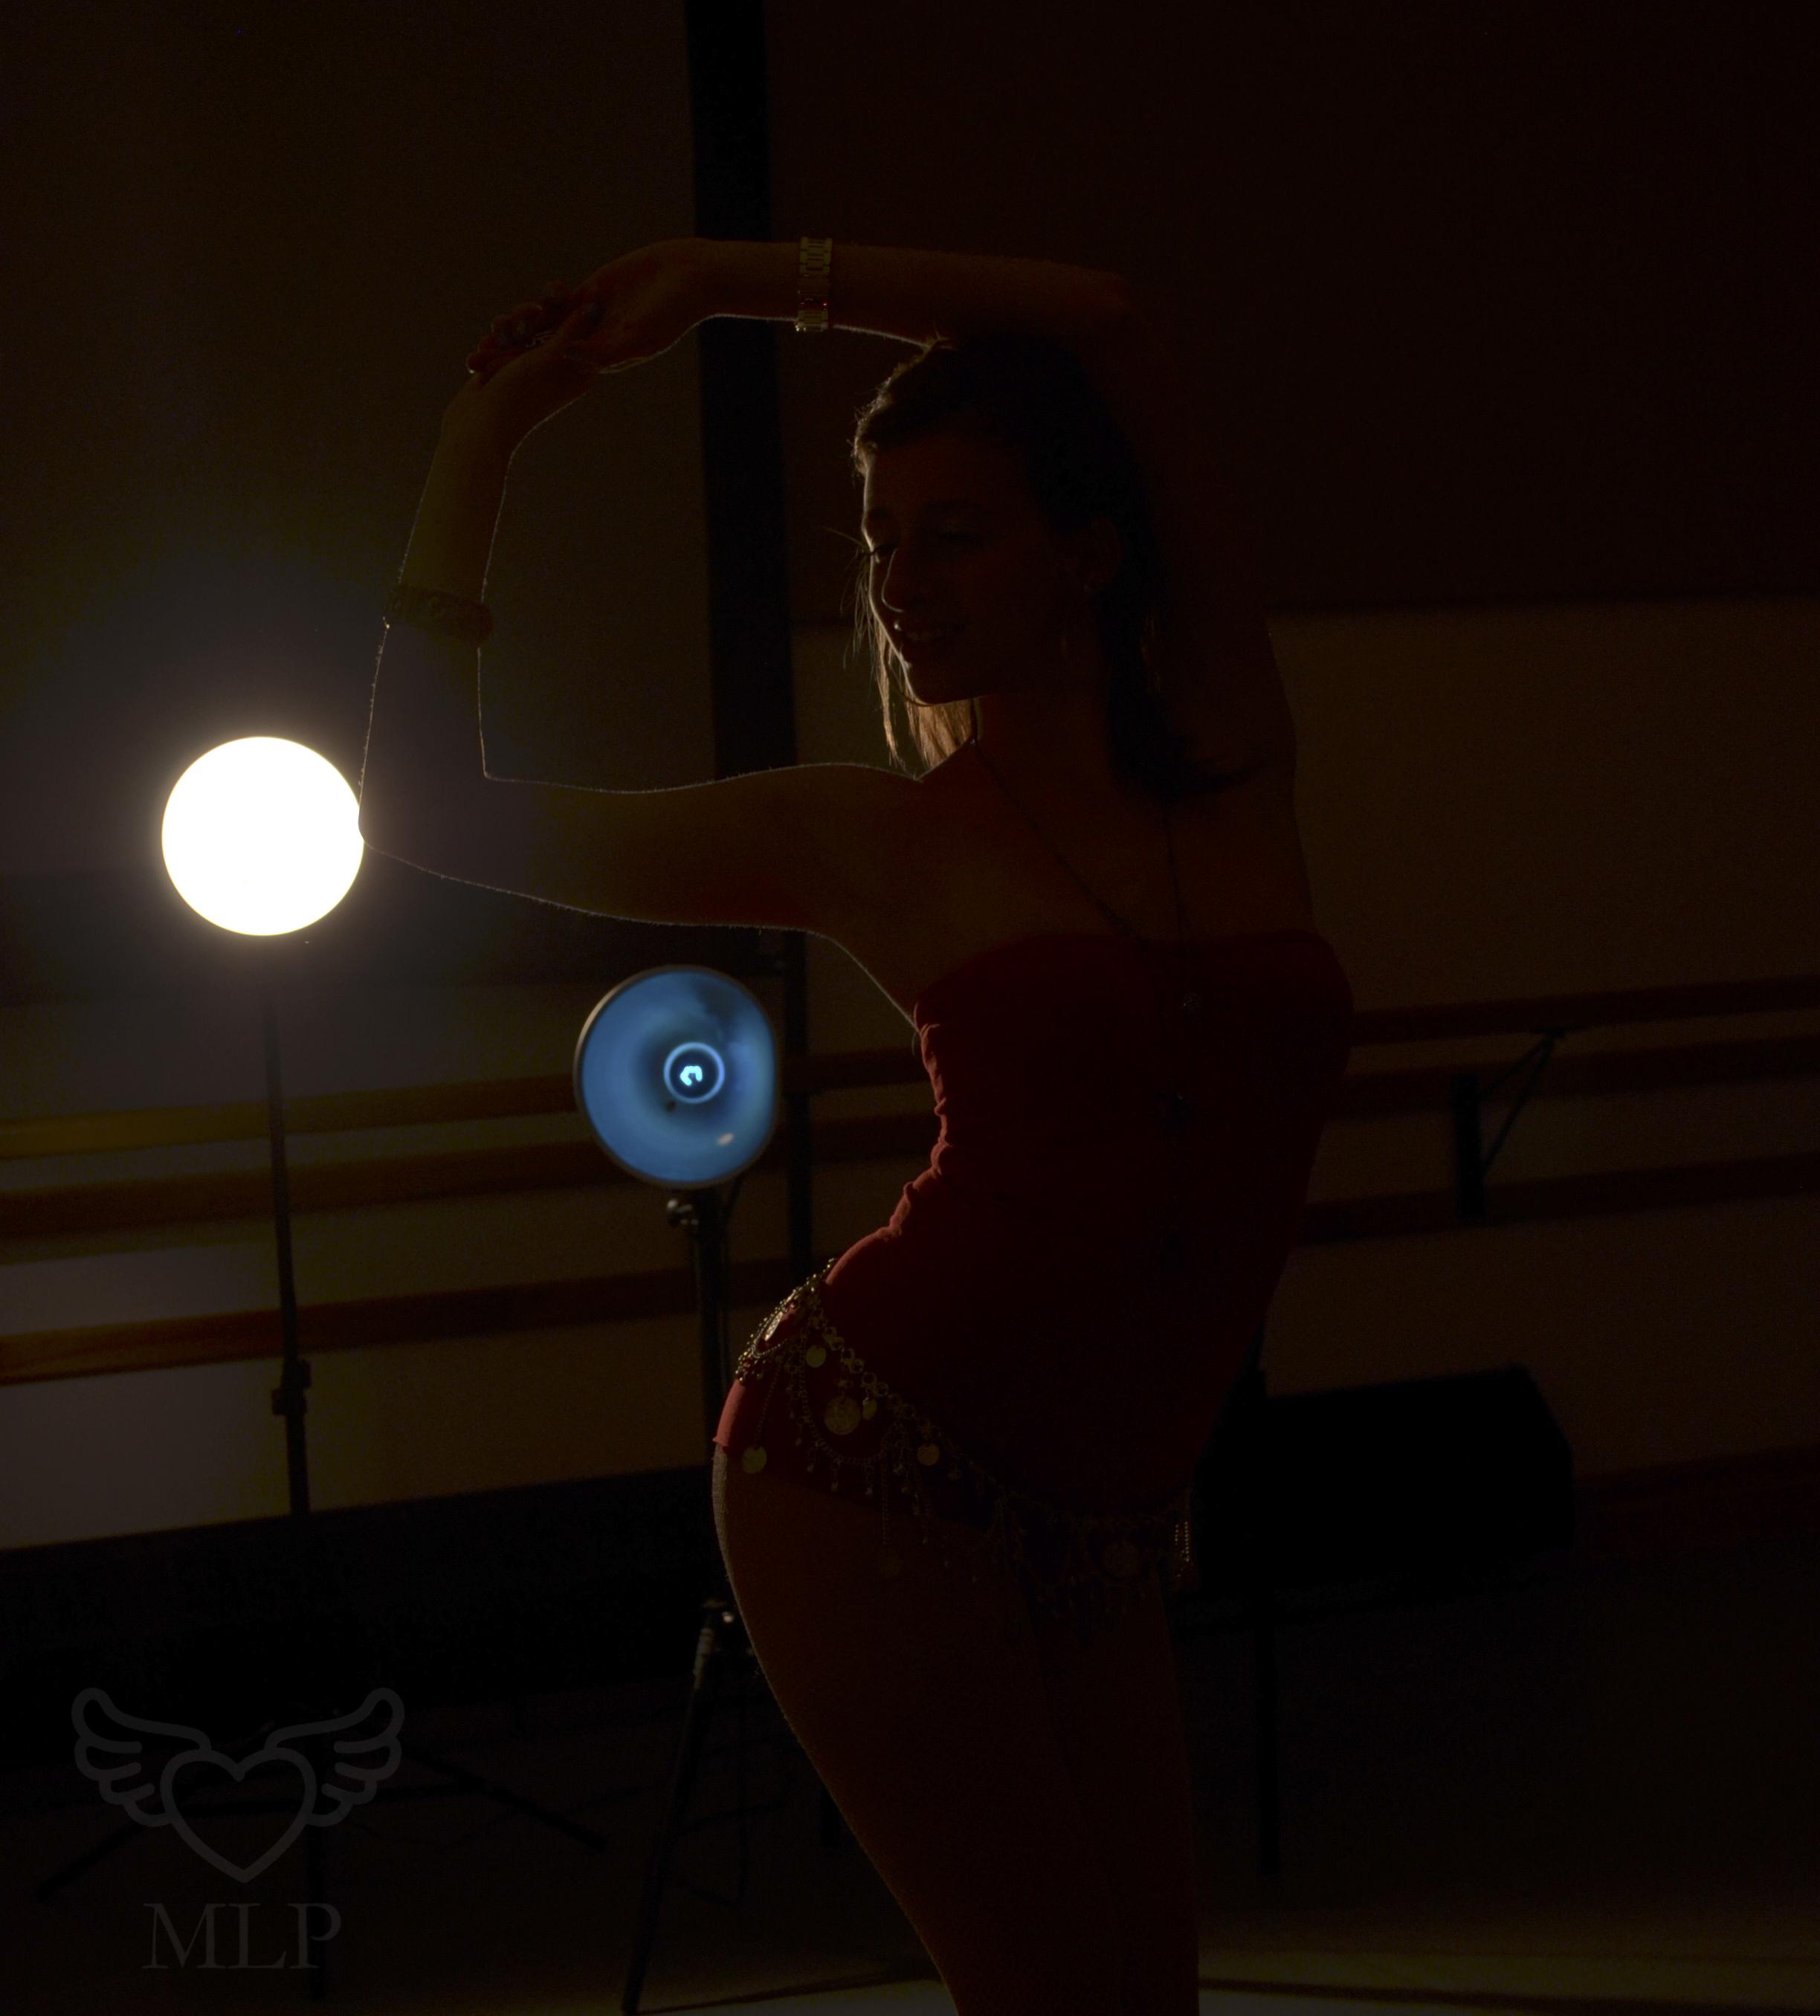 Dance_Photography_8.jpg